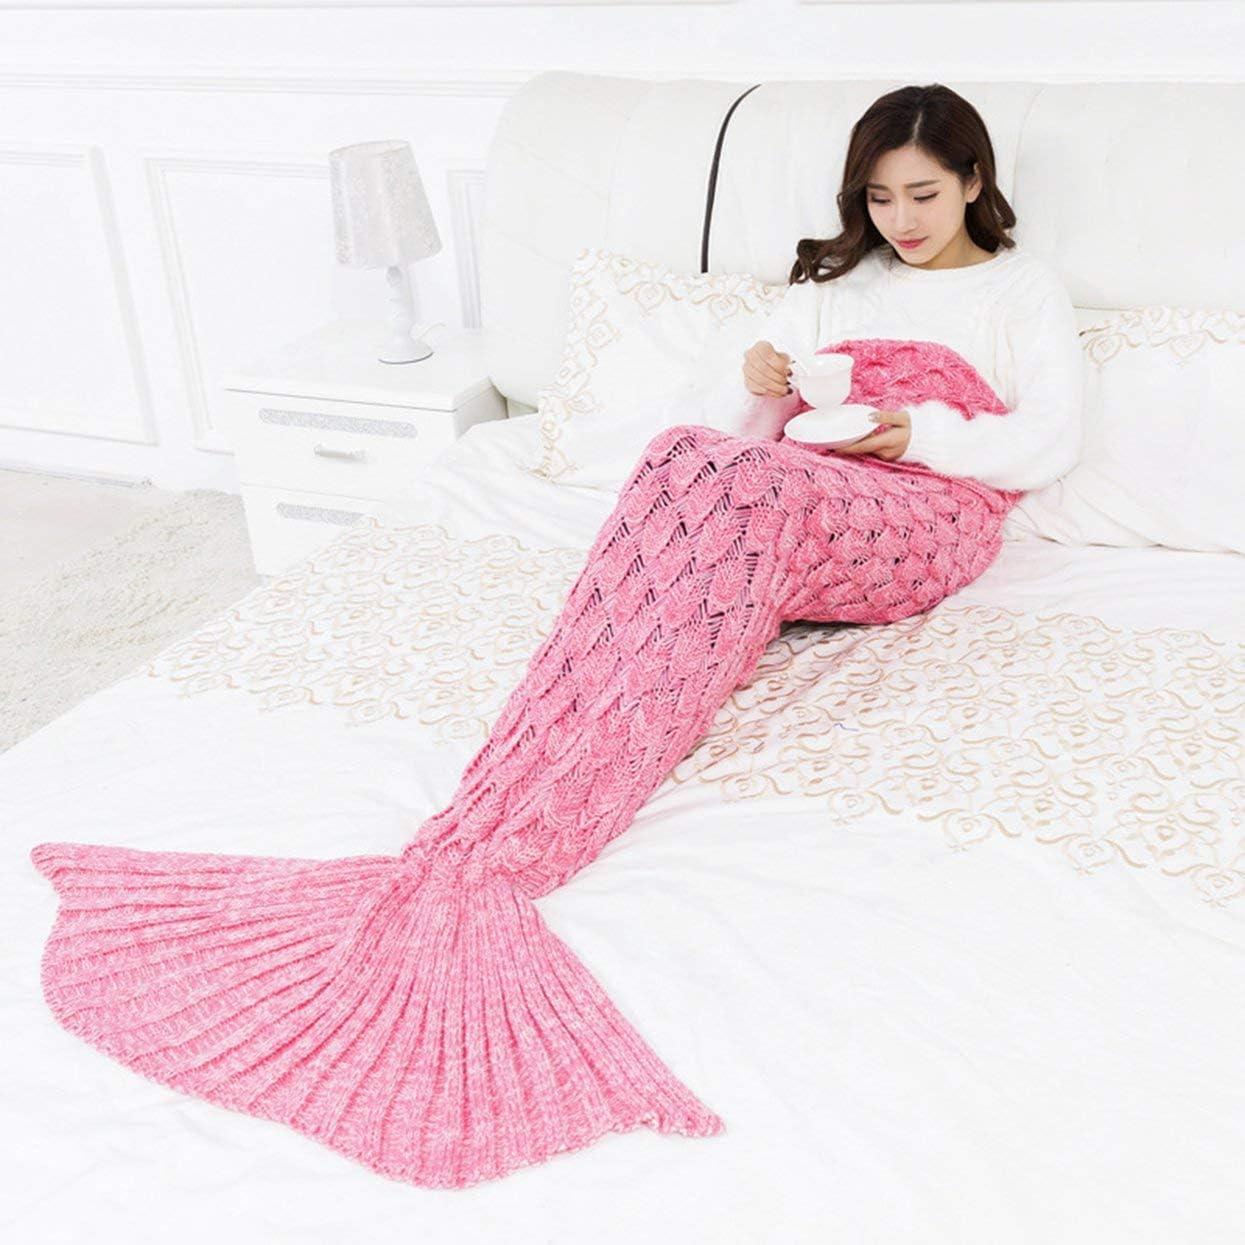 ShenyKan Mermaid Blanket Handmade Knitted Sleeping Wrap Tv Sofa Manta de cola de sirena Kids Adult Baby Baby Crocheted Bag Bedding Throw Bag